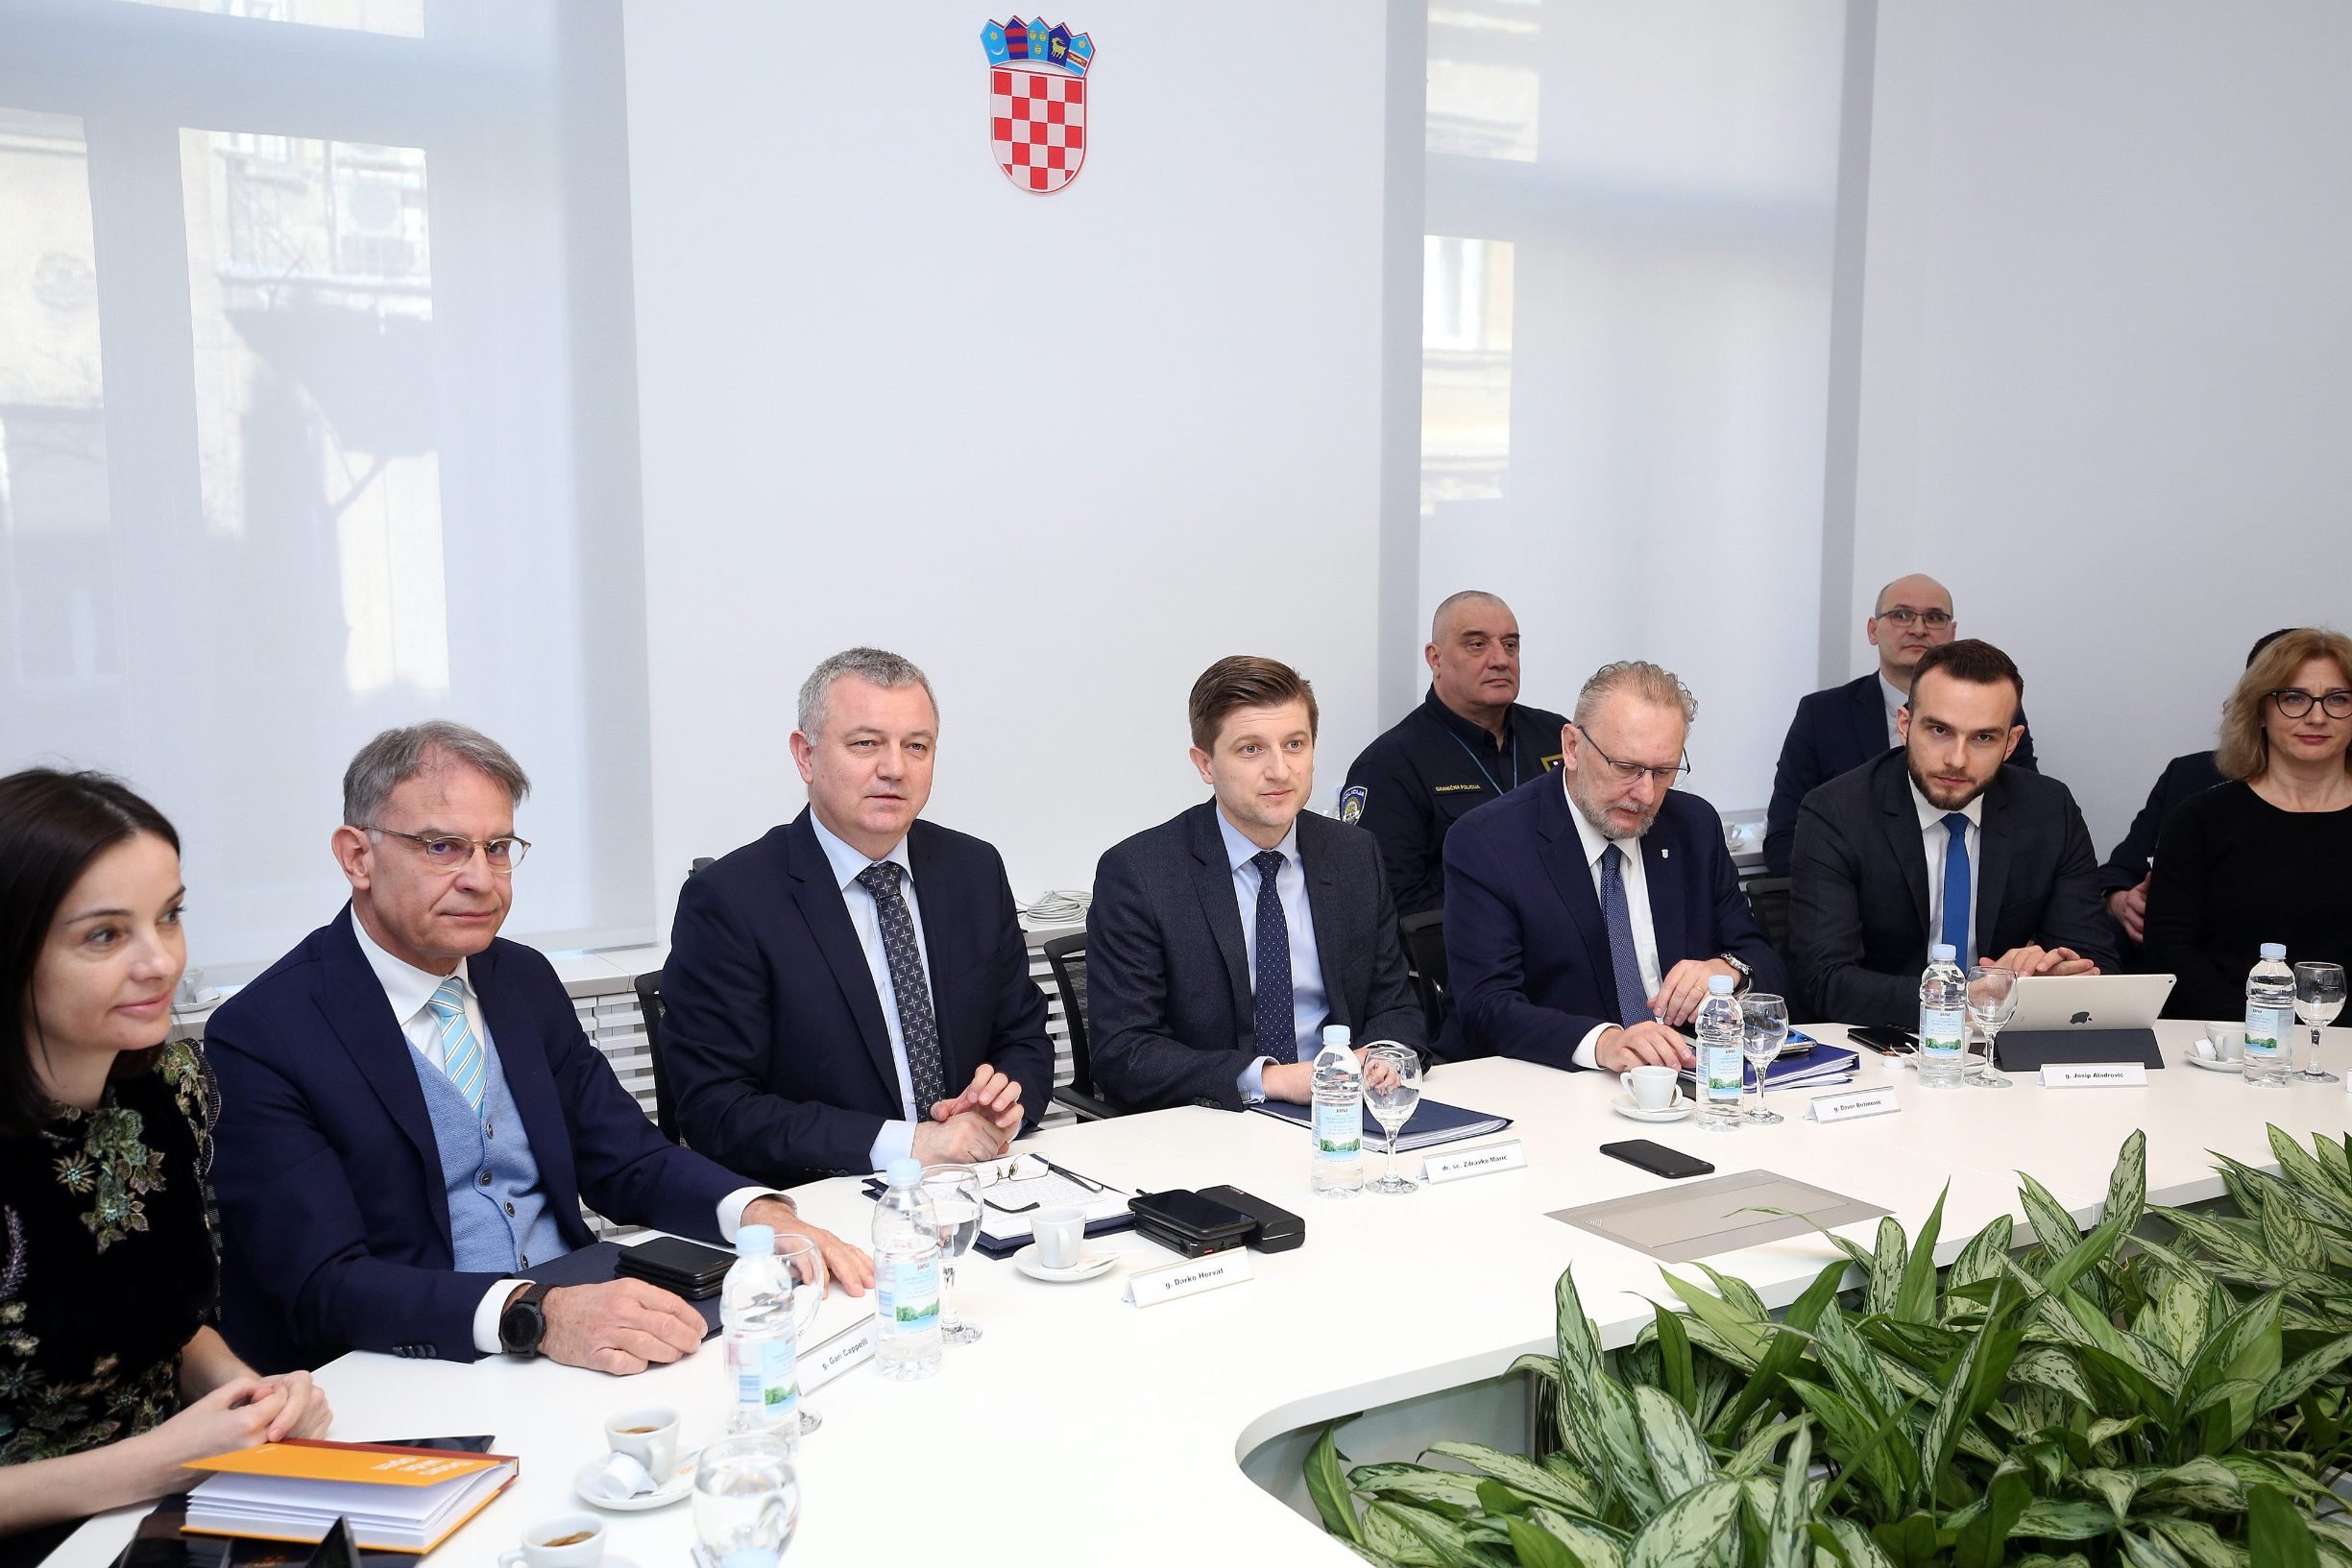 Gari Cappelli, Darko Horvat, Zdravko Marić, Davor Božinović, Josip Aladrović